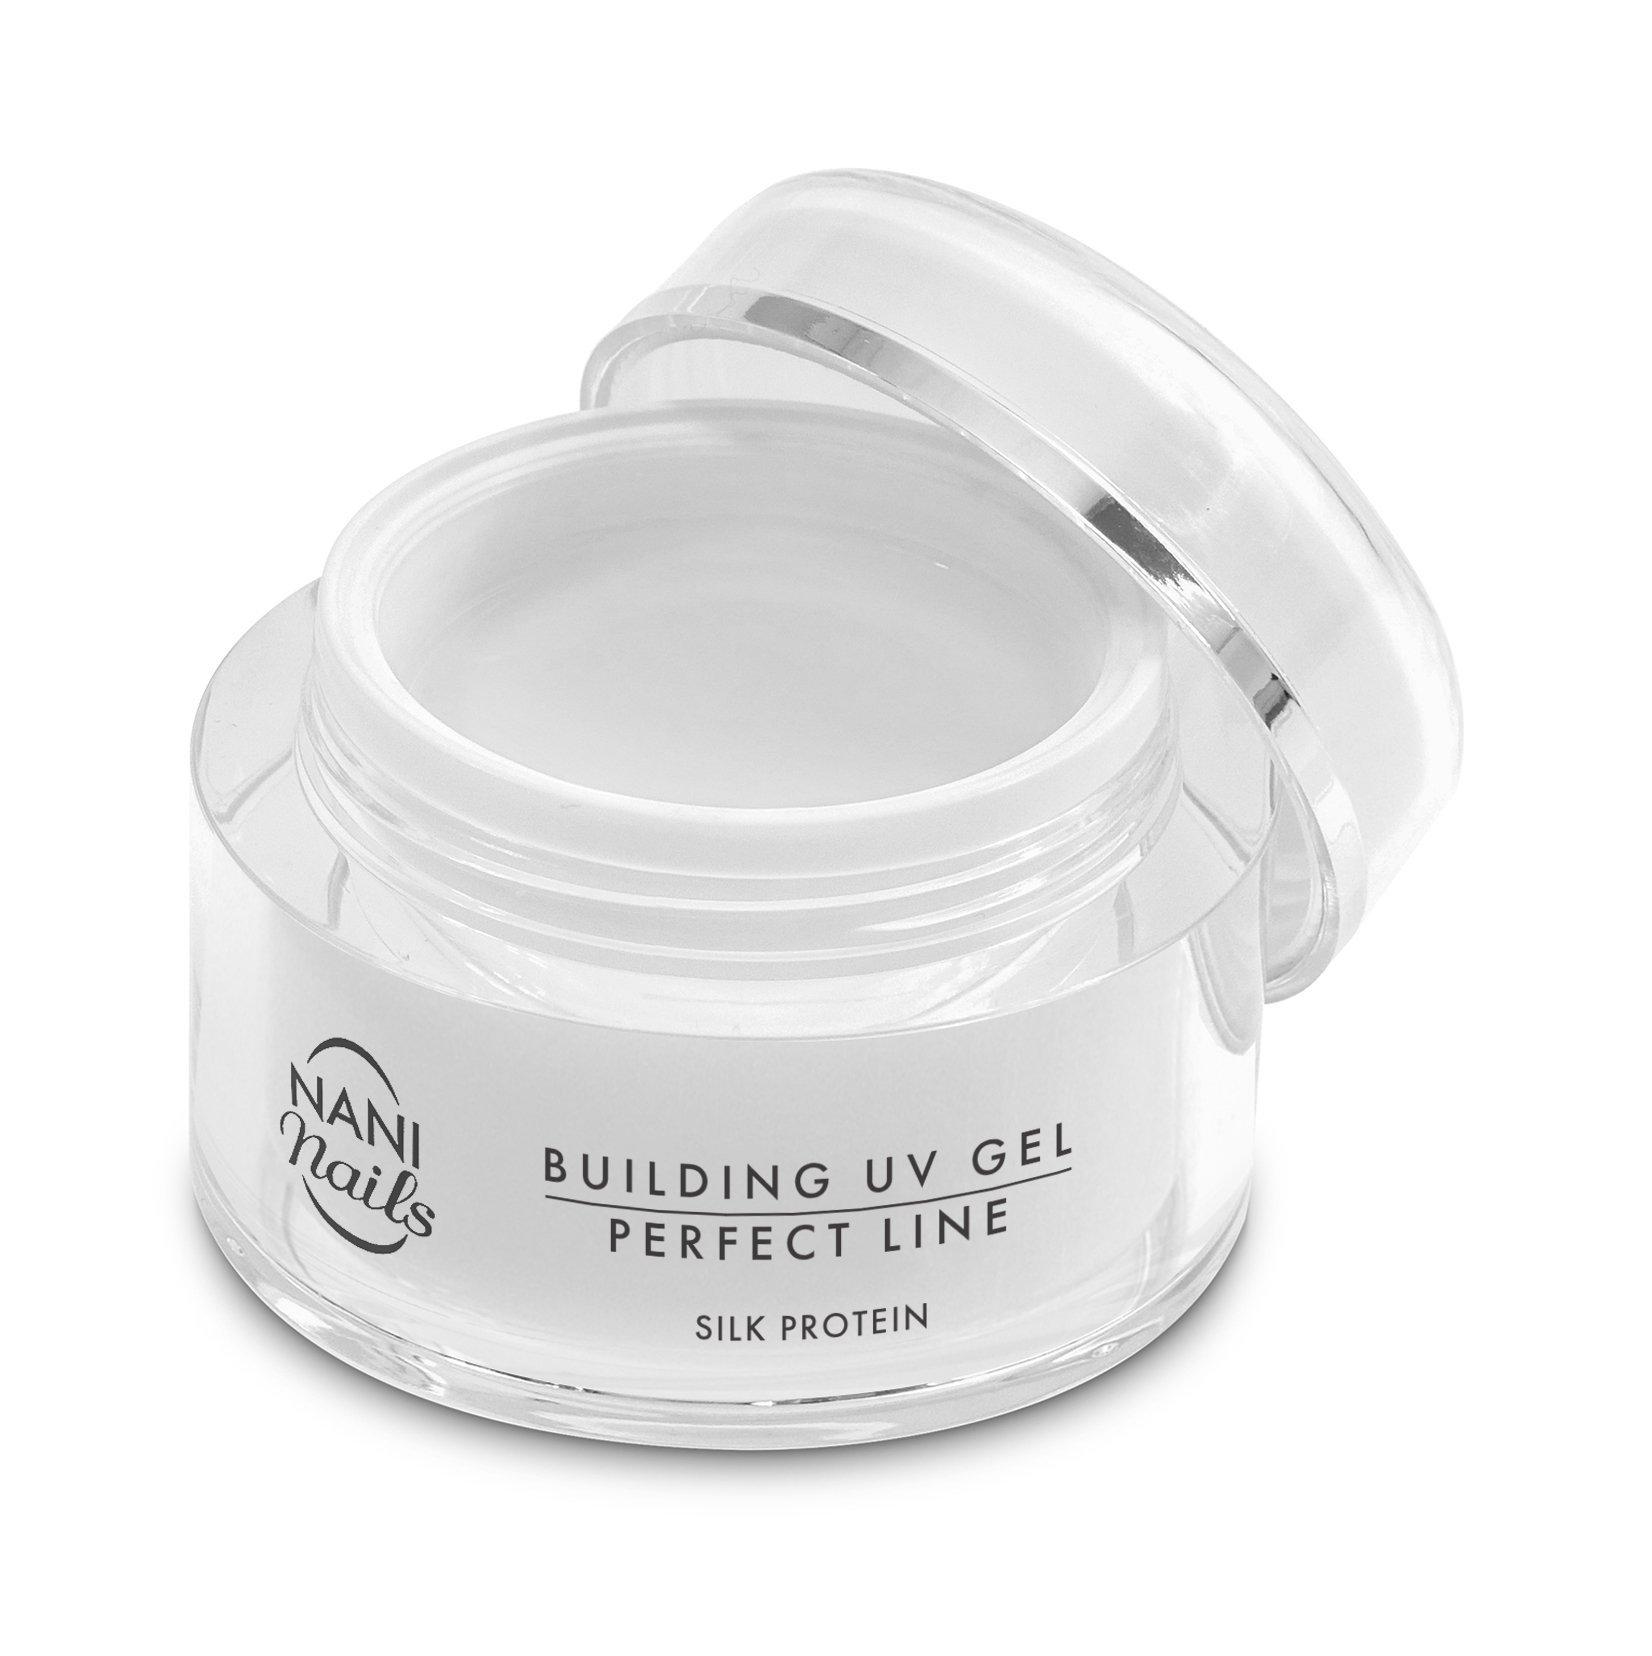 NANI UV gél Perfect Line 30 ml - Silk Protein